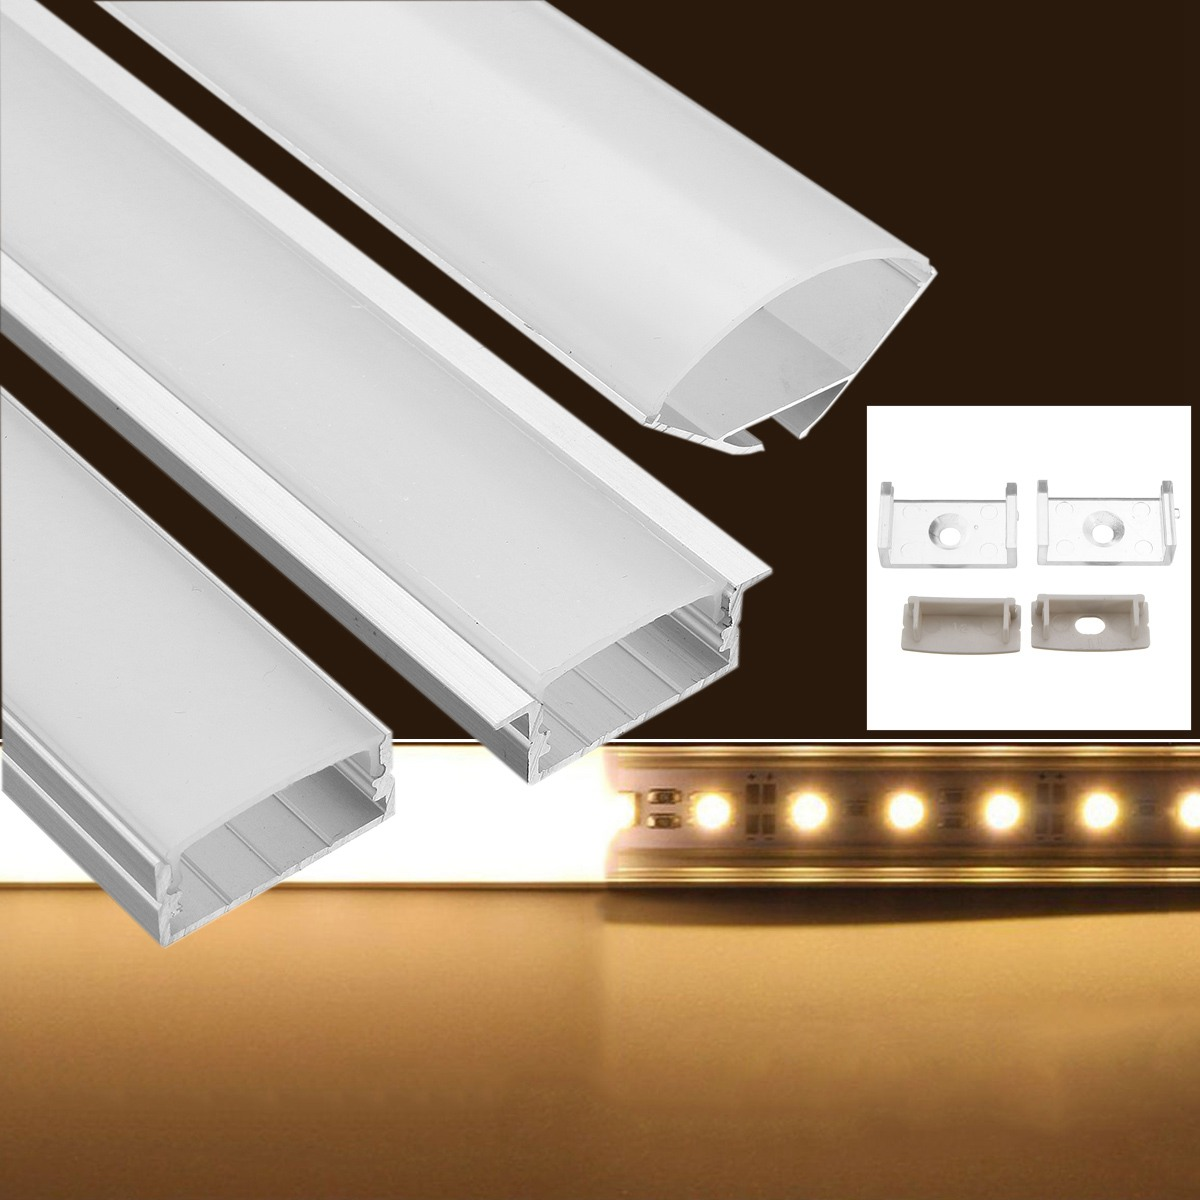 U/YW/V Shape Aluminium 50CM Channel Holder For LED Strip Light Led Bar Light Lamp With Cover Buckle